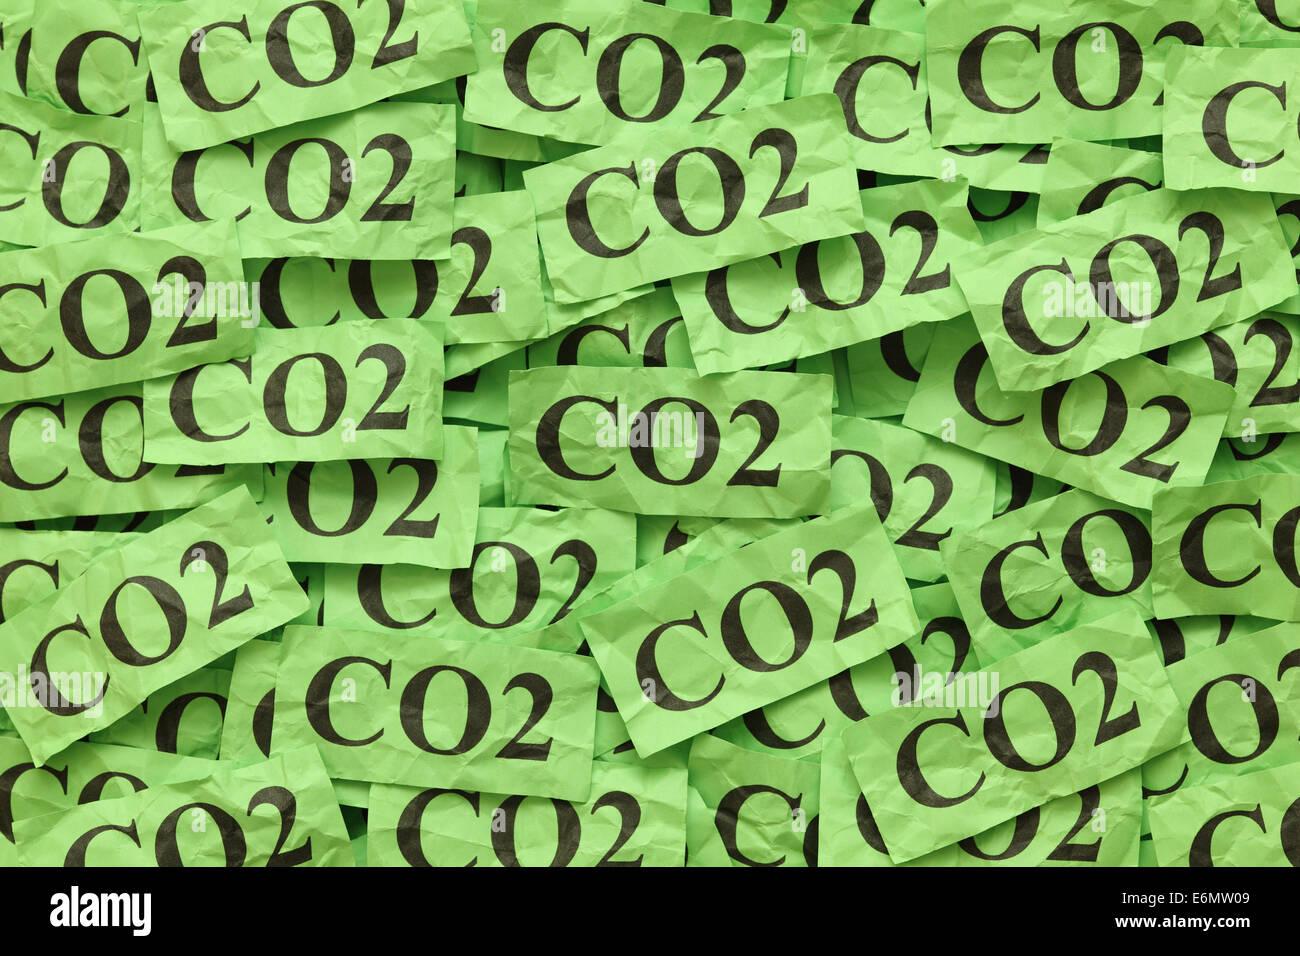 "Montón de notas de papel verde con la palabra ""CO2"" (dióxido de carbono). Imagen De Stock"